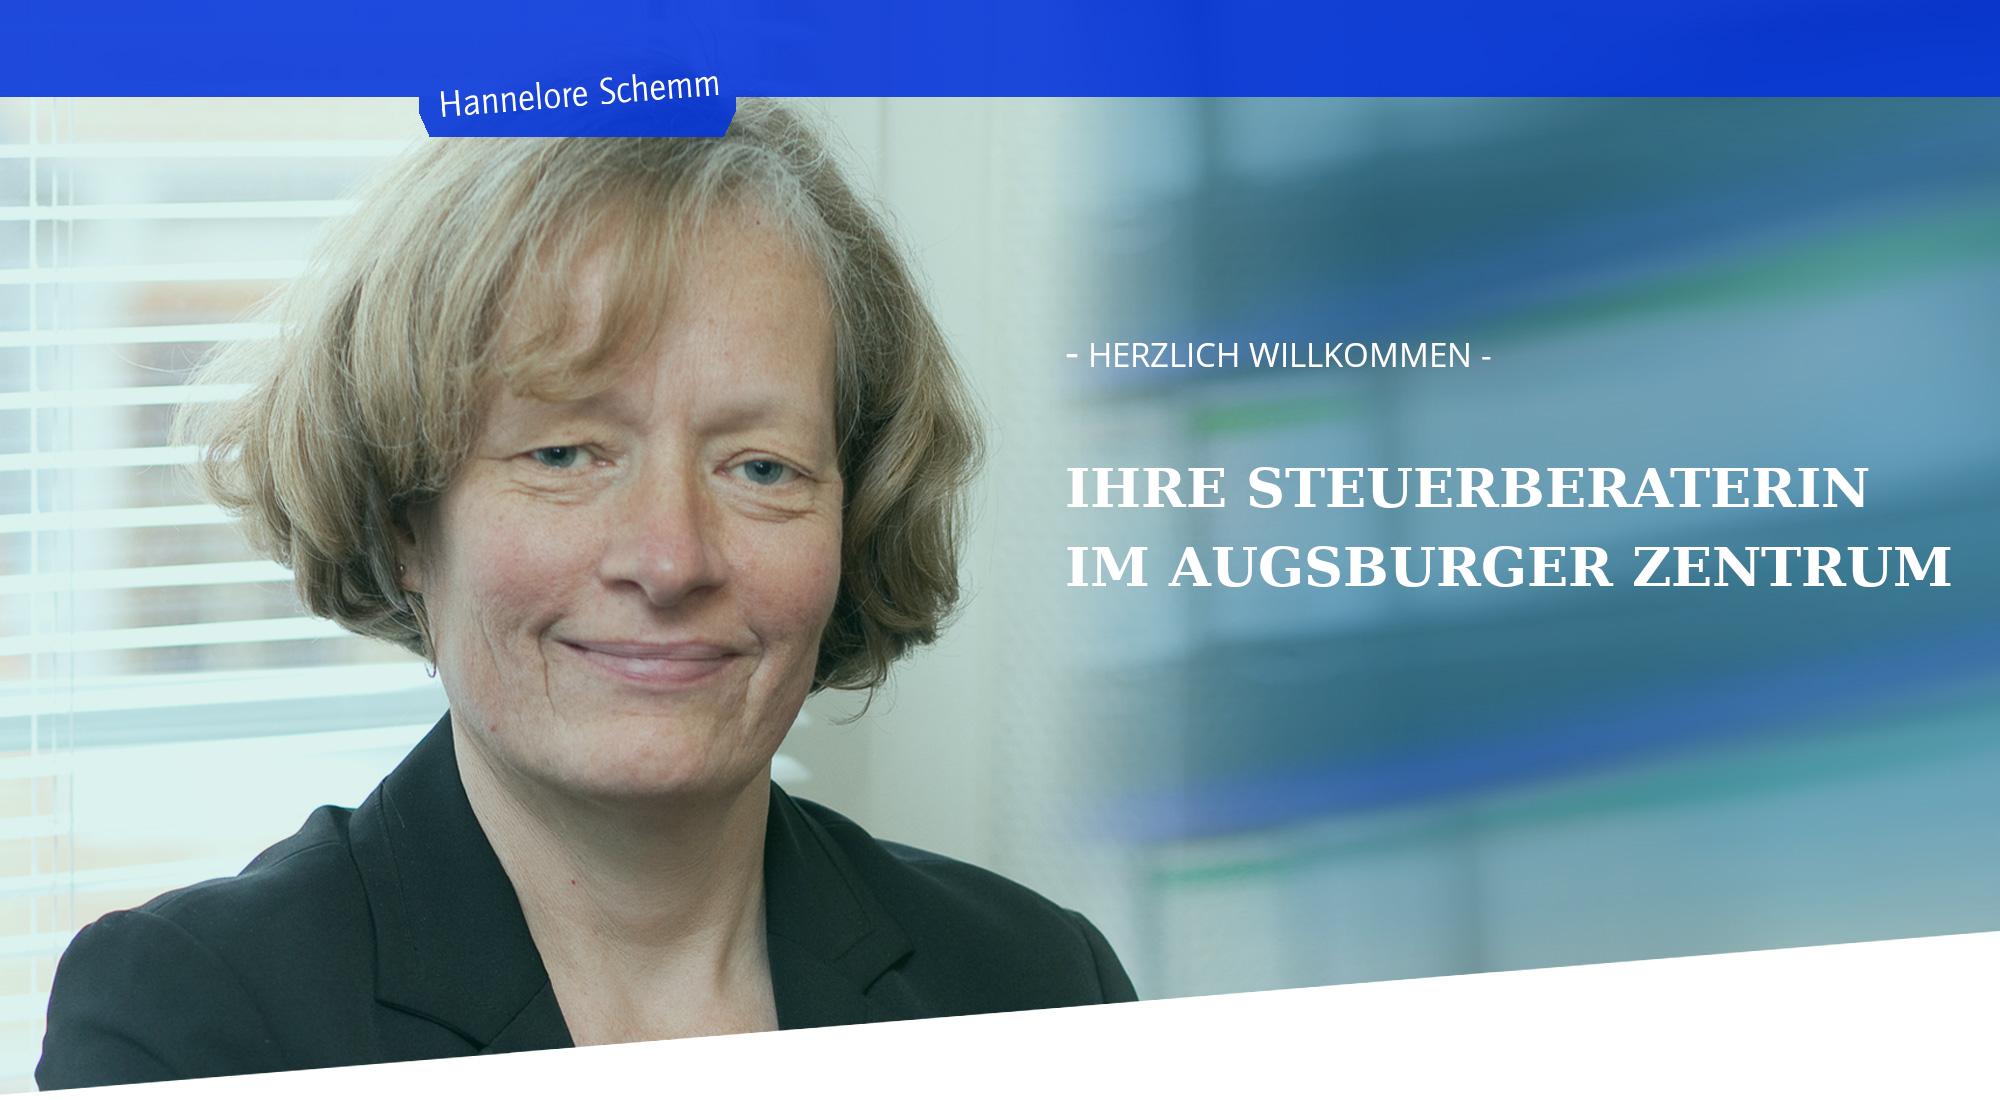 Steuerberaterin in Augsburg